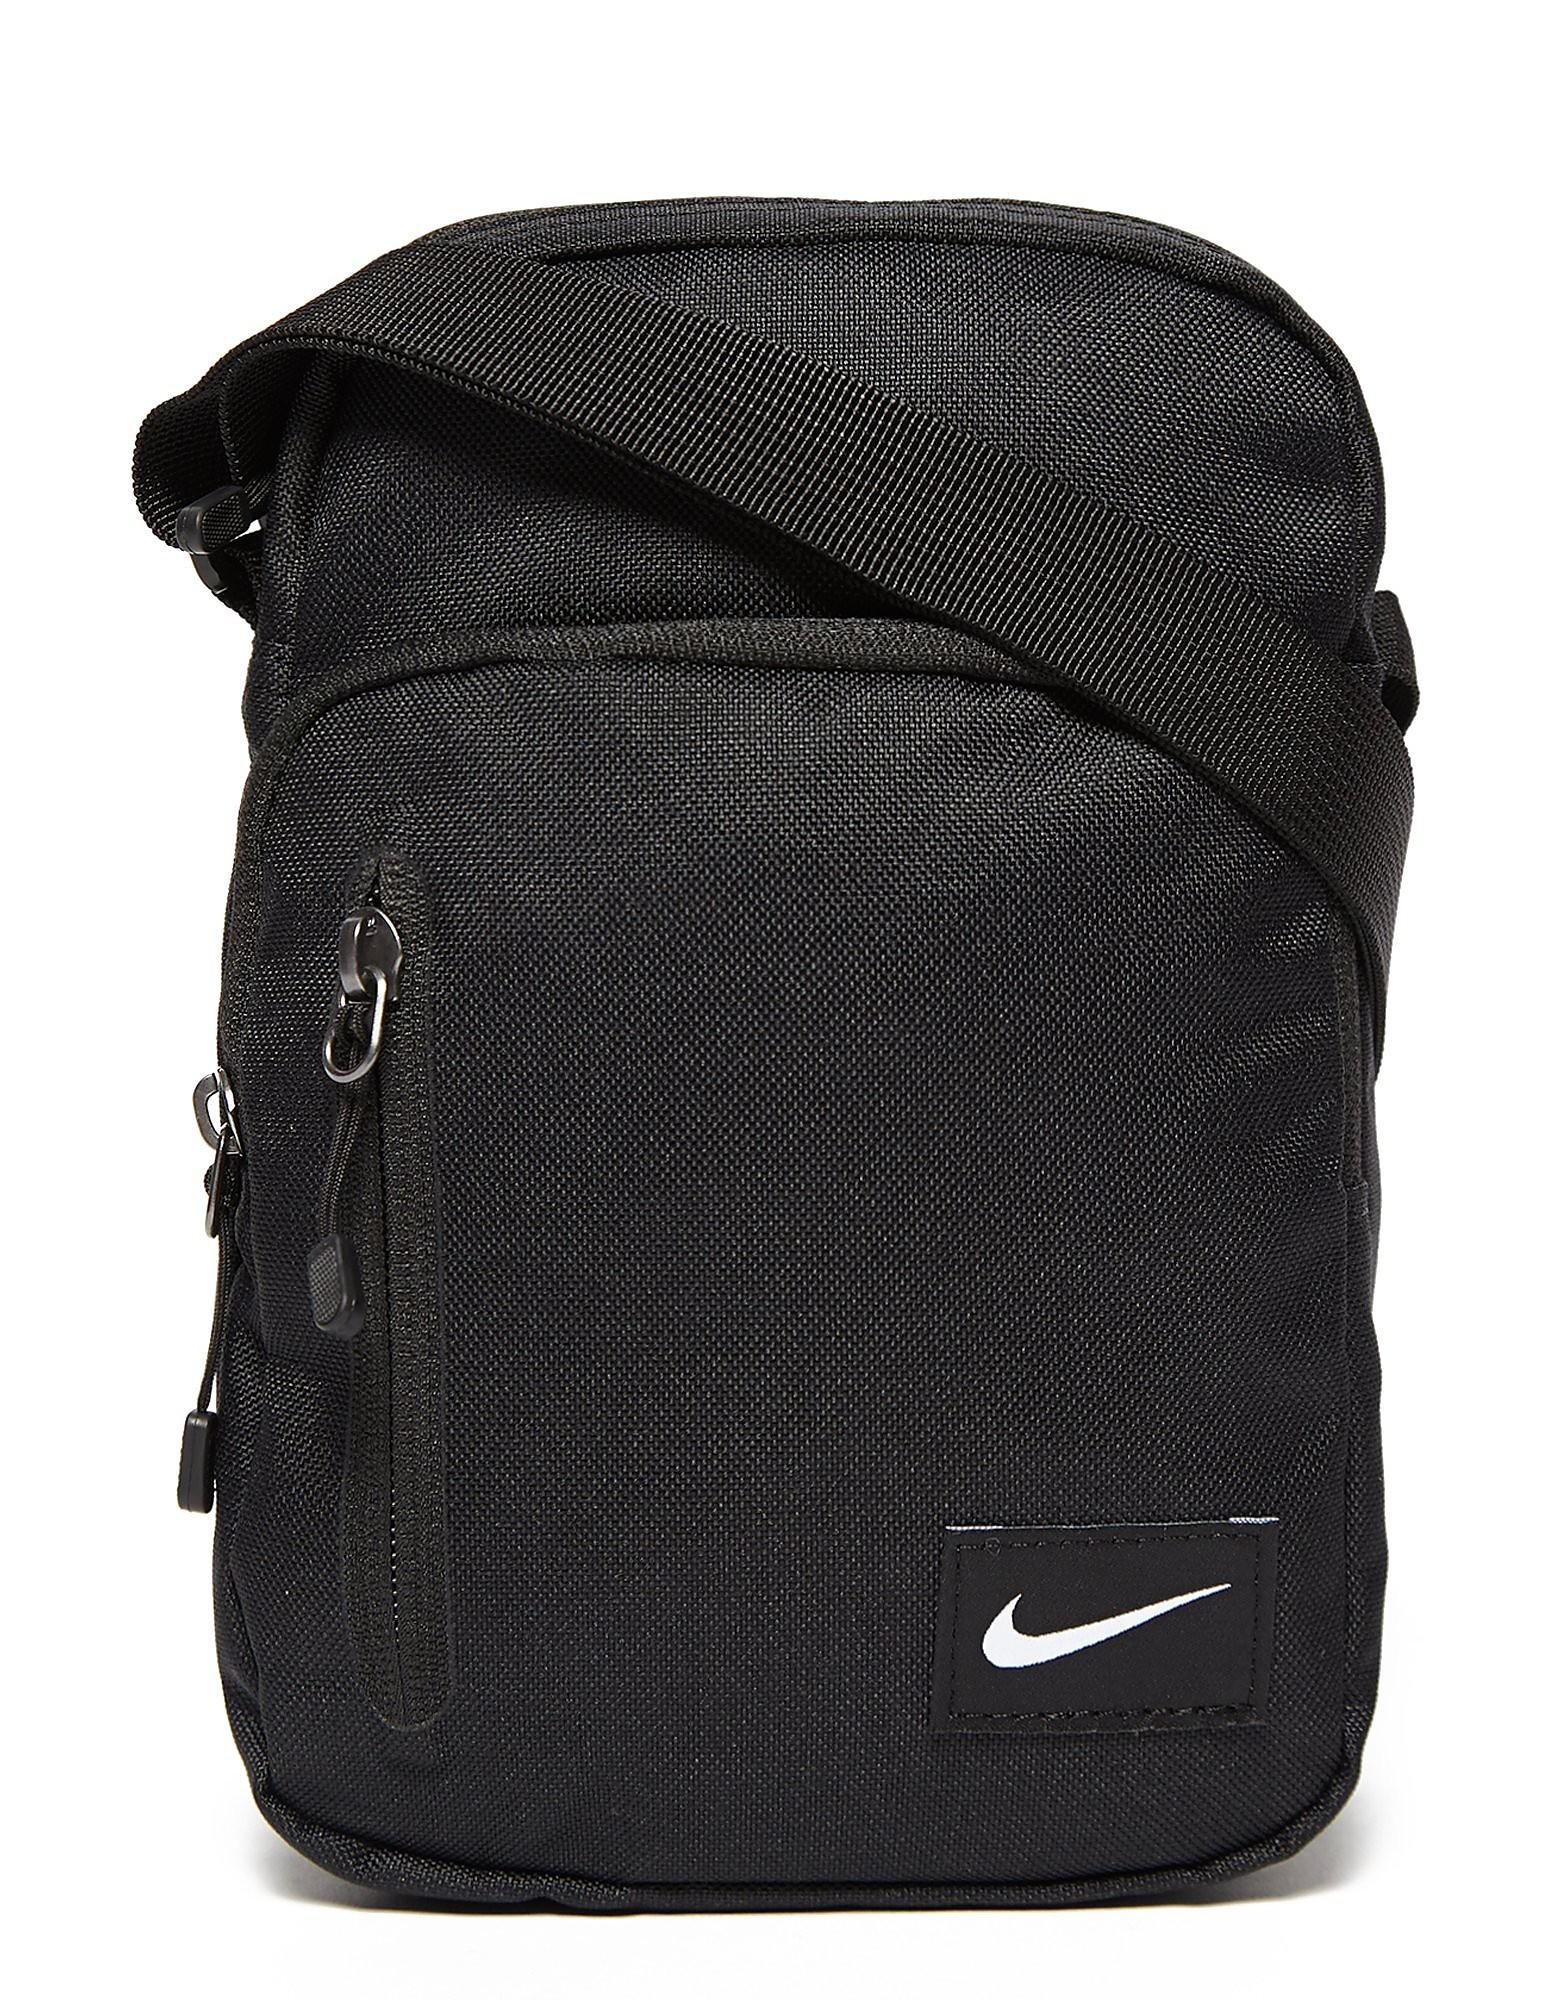 Nike Core Small Items Bag II - Black - Mens, Black